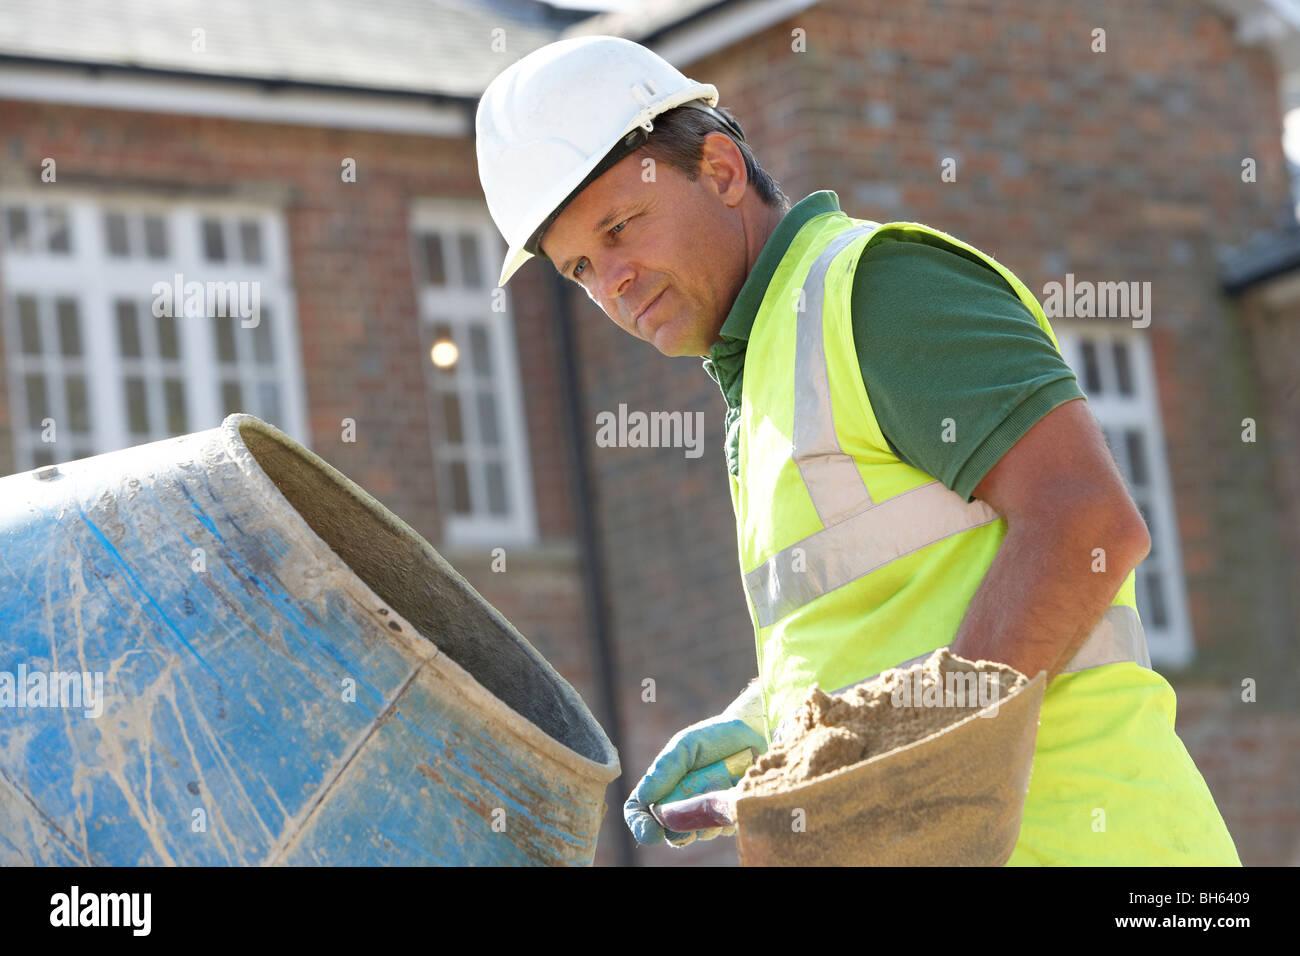 construction worker mischen zement stockfoto bild 27794377 alamy. Black Bedroom Furniture Sets. Home Design Ideas